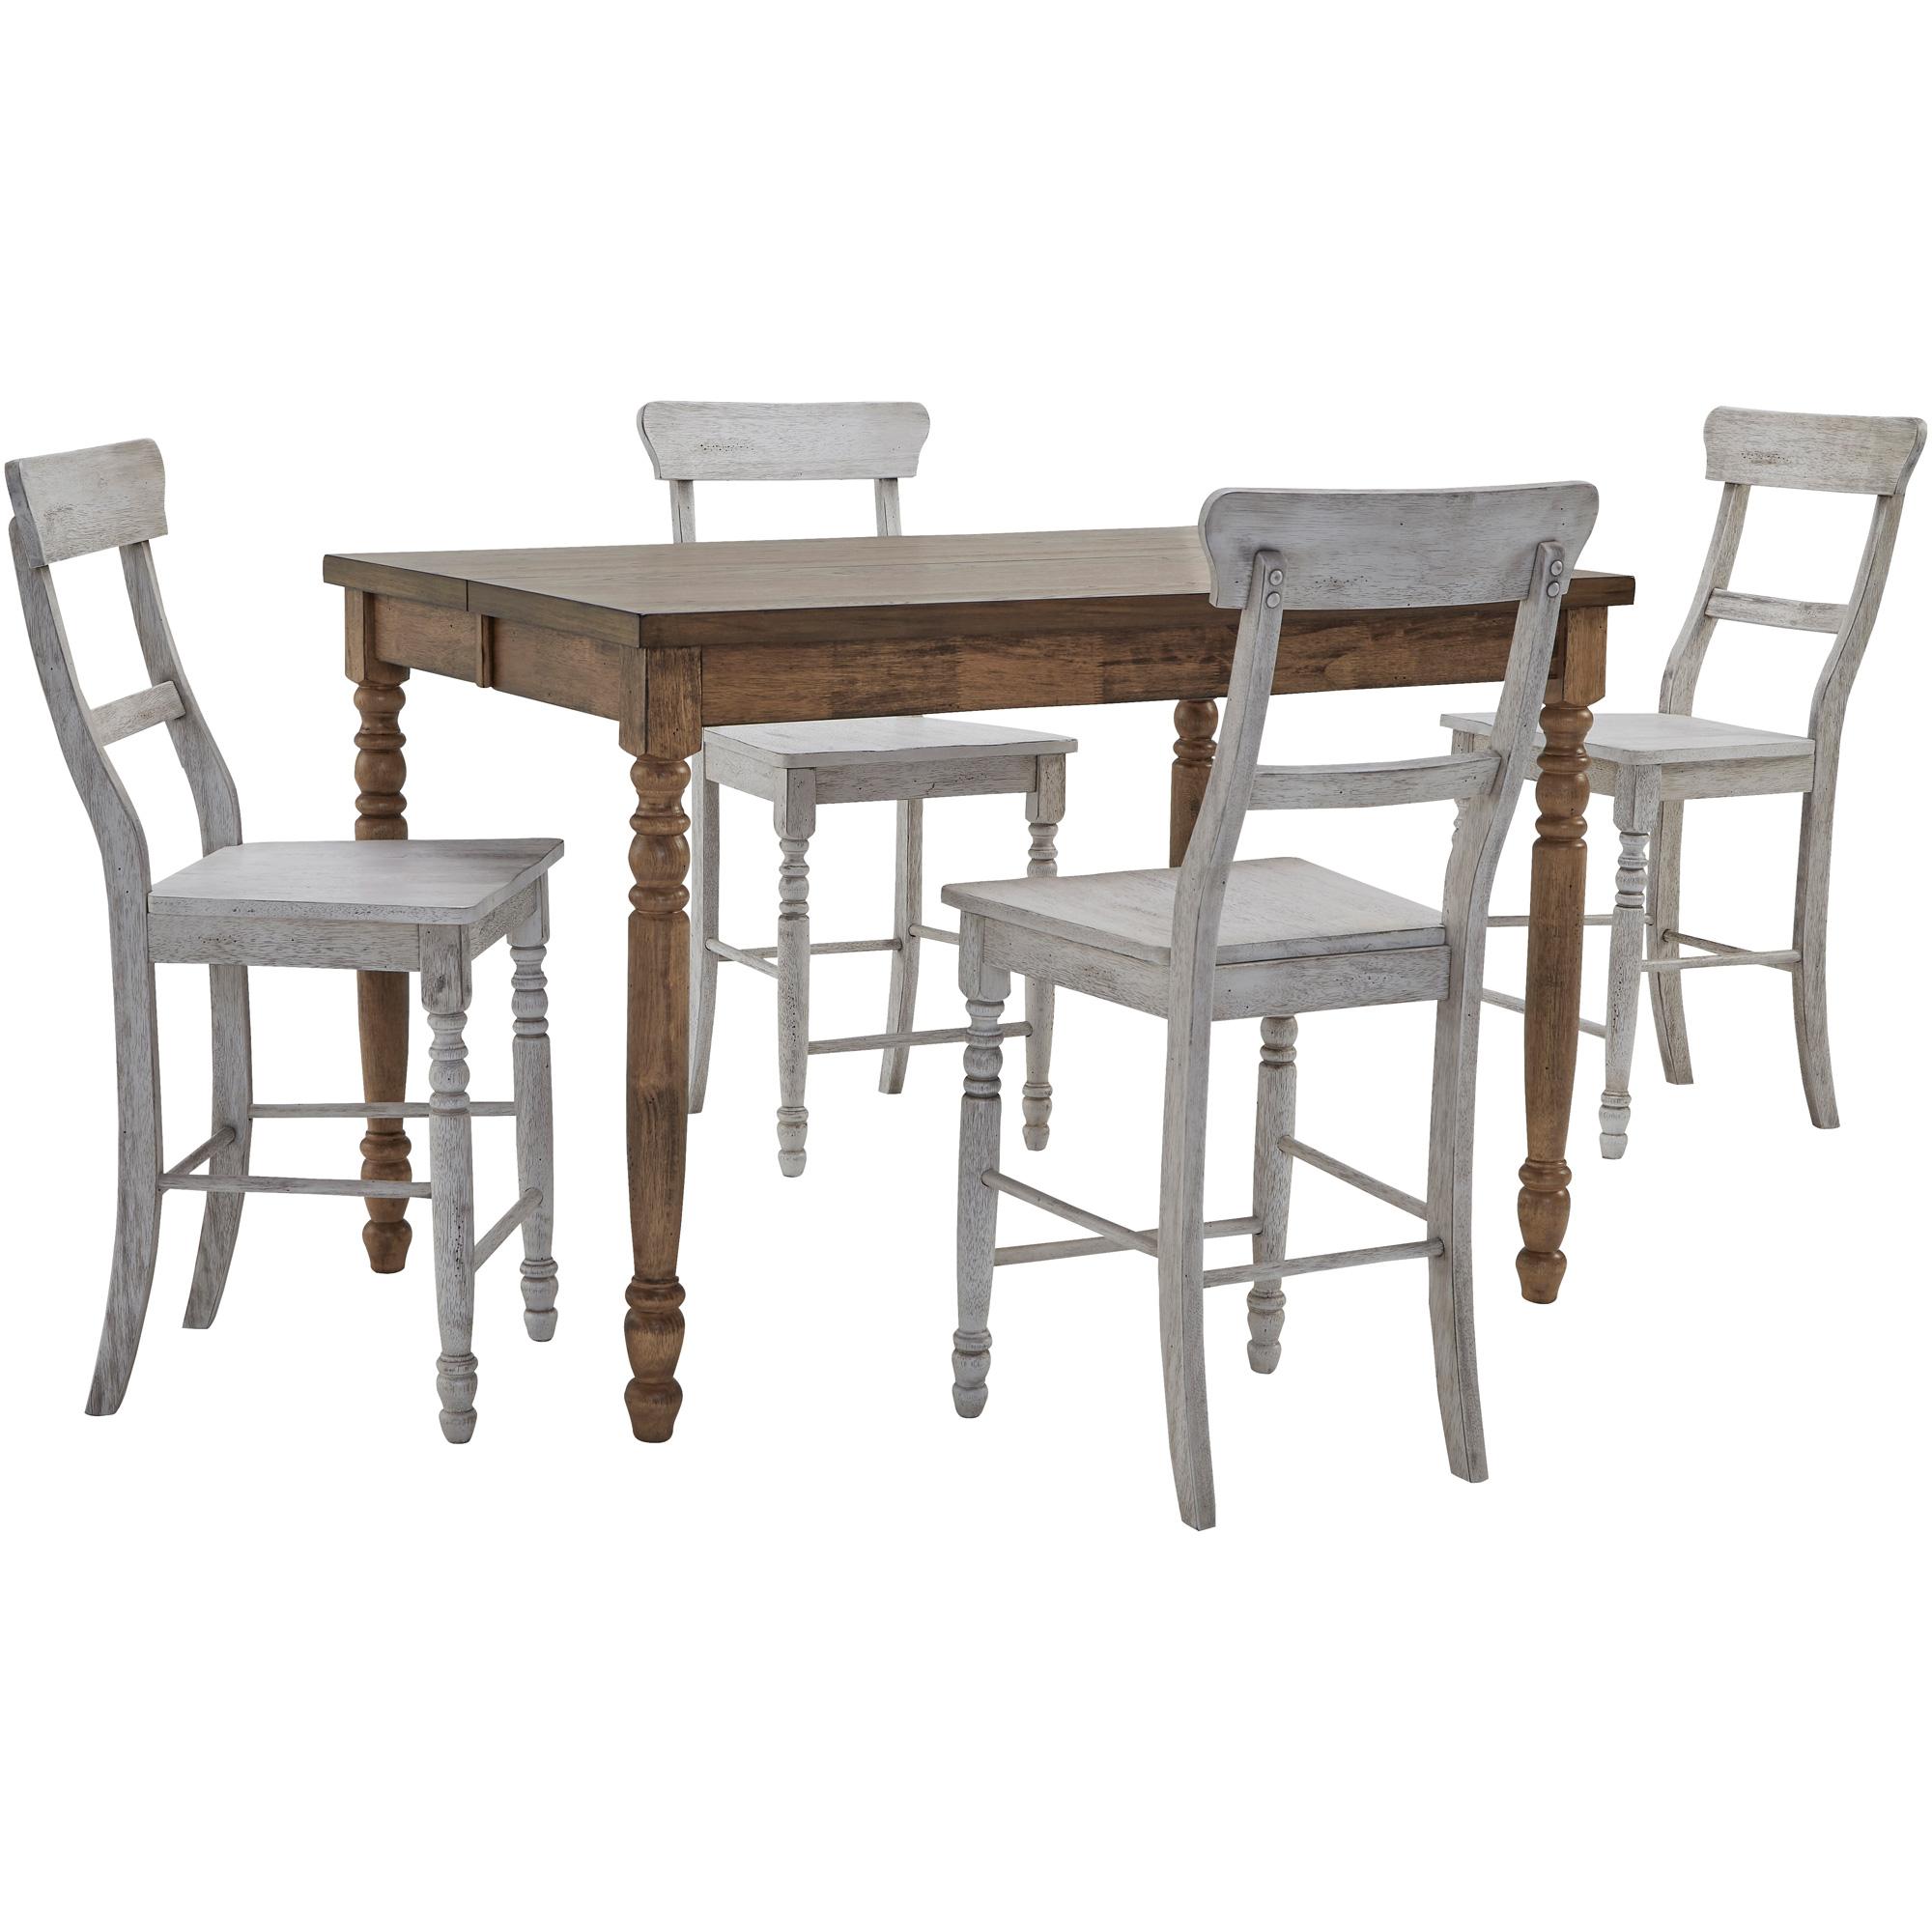 Progressive Furniture Inc. | Savannah Court Antique Oak and White 5 Piece Counter Dining Set